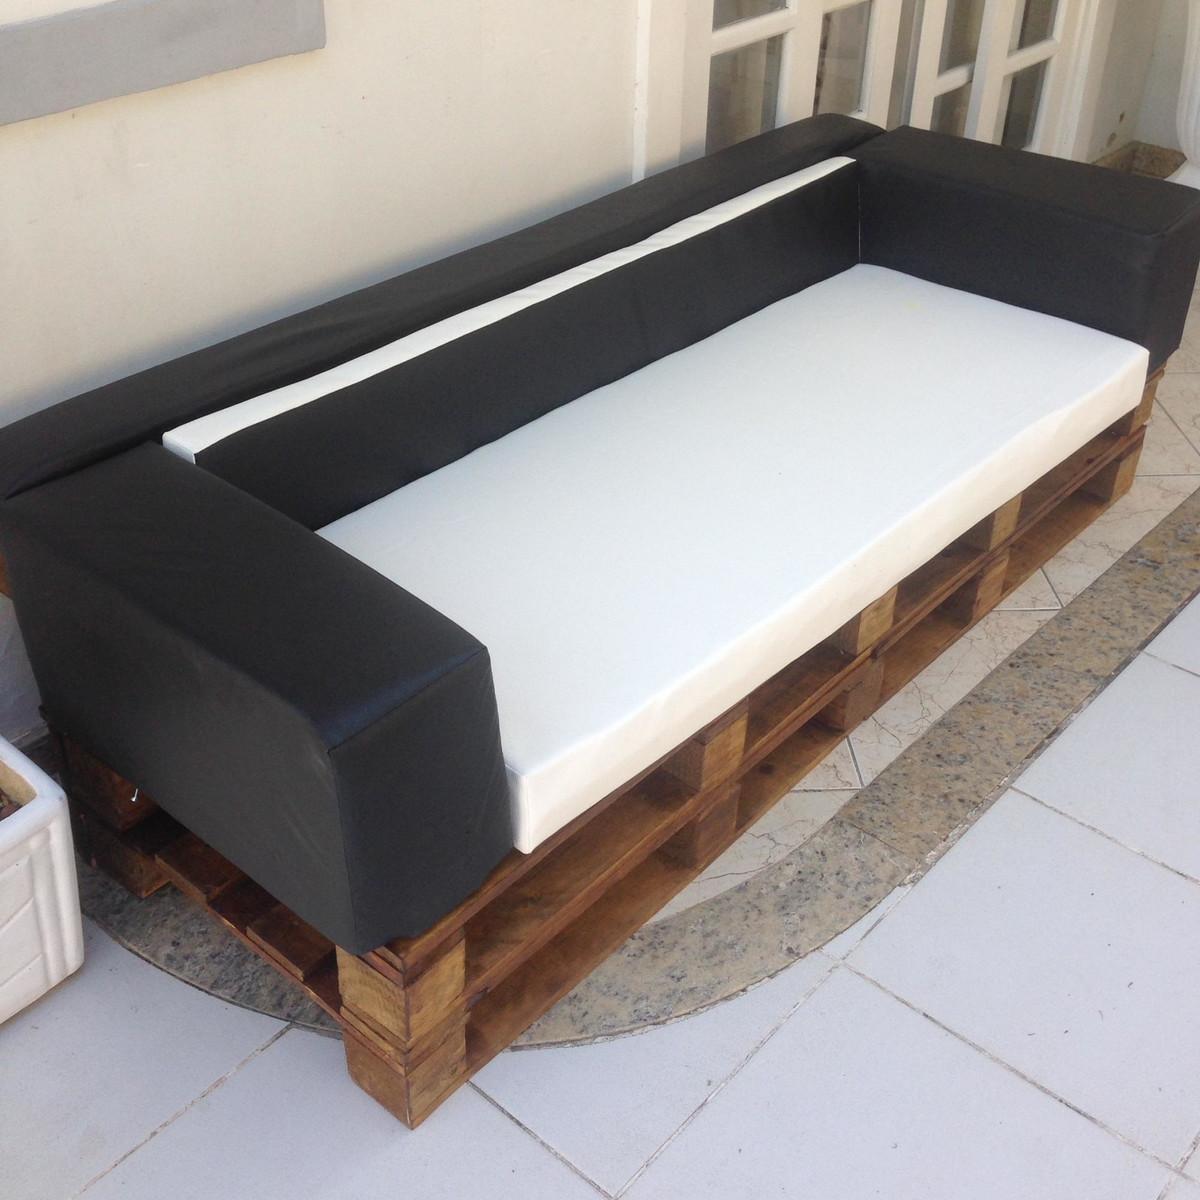 Sofá de pallet com estofado de couro para 3 lugares